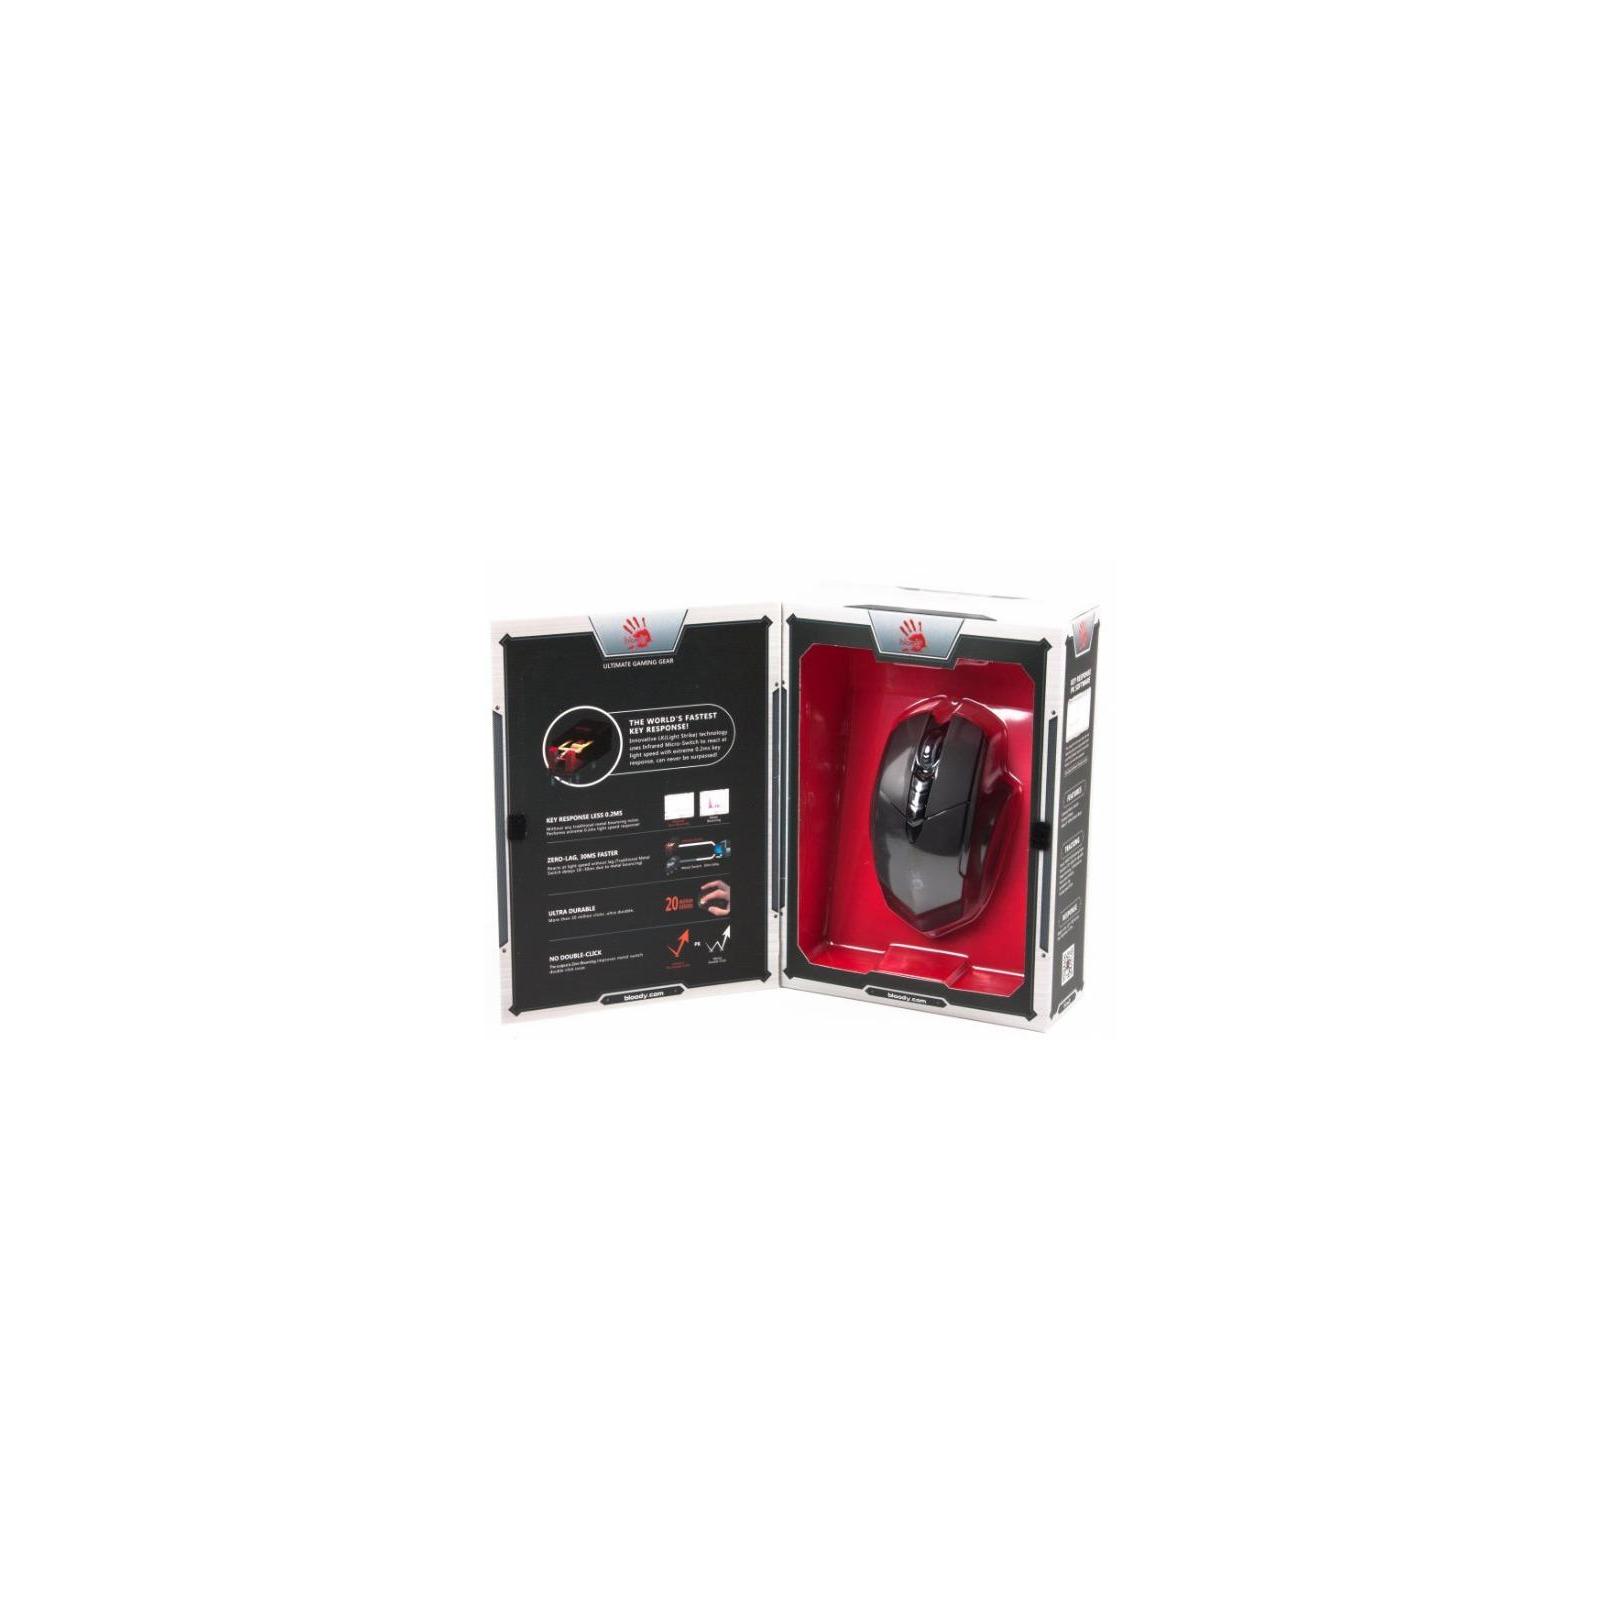 Мышка A4tech Bloody R70A Black изображение 10